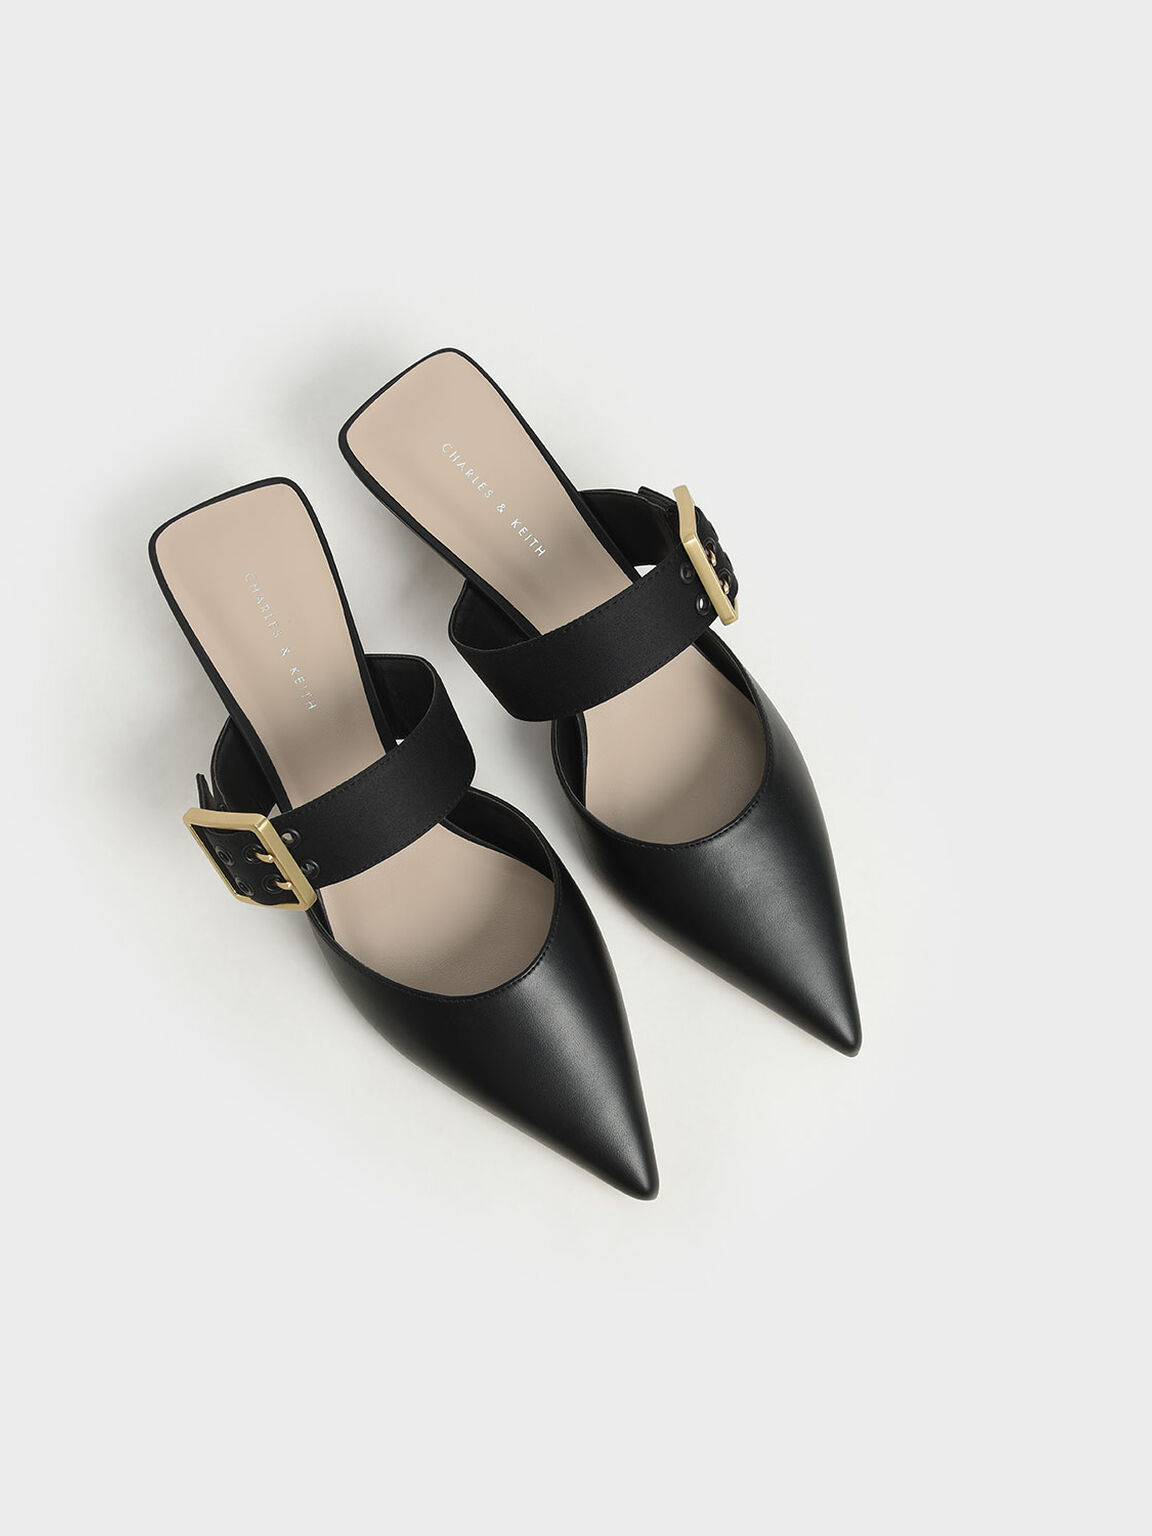 Sepatu Satin Grommet Buckle Mules, Black, hi-res